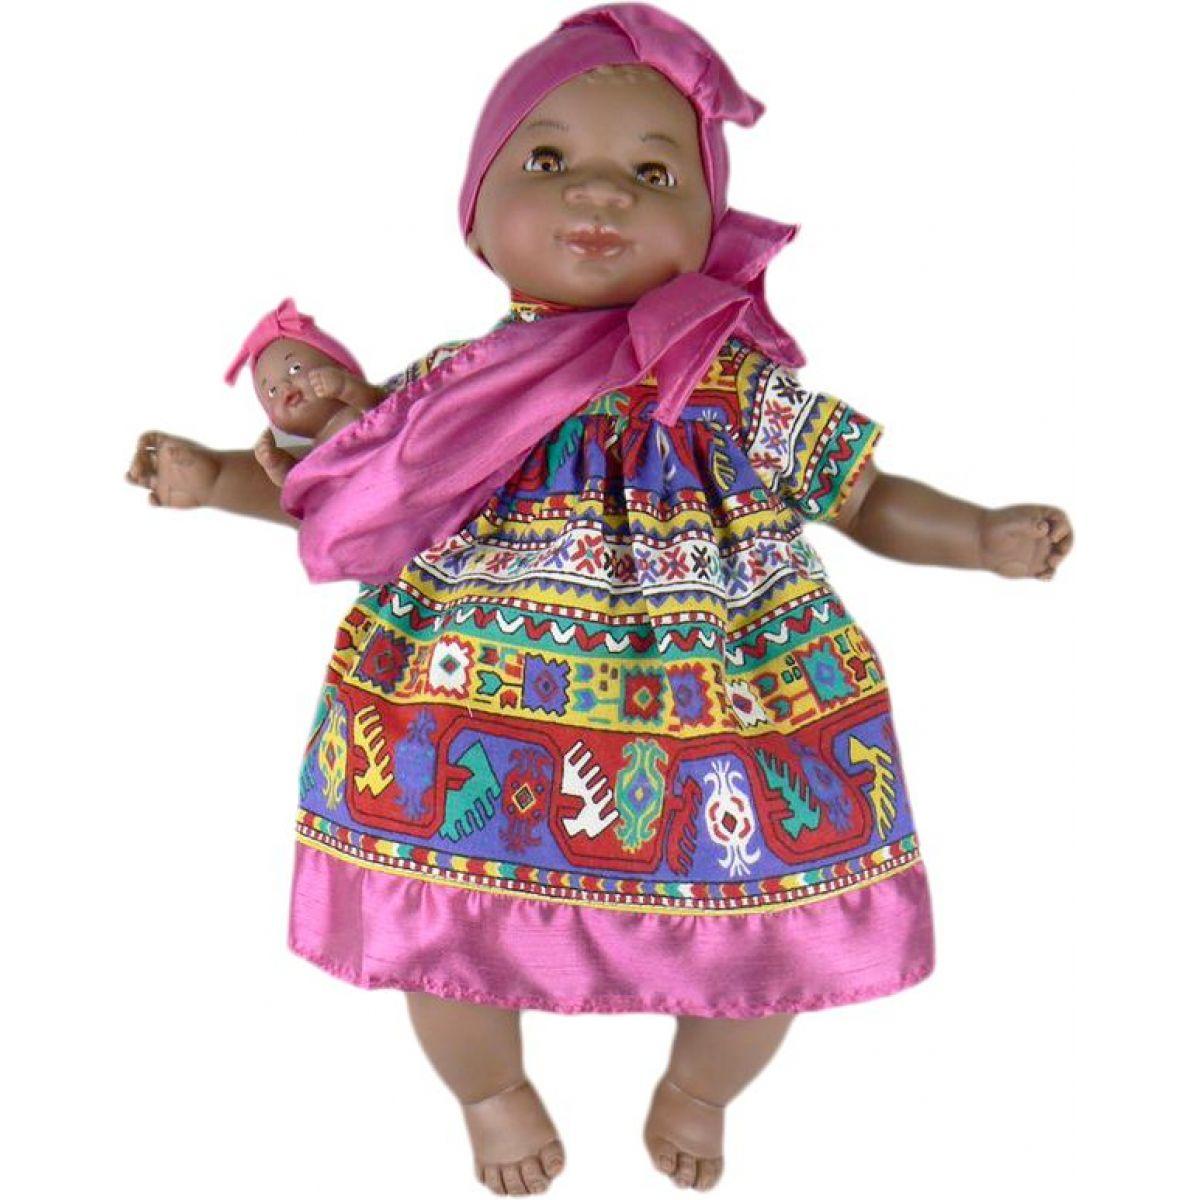 Nines Maha Con Bebe 45 cm - Růžové s ornamenty